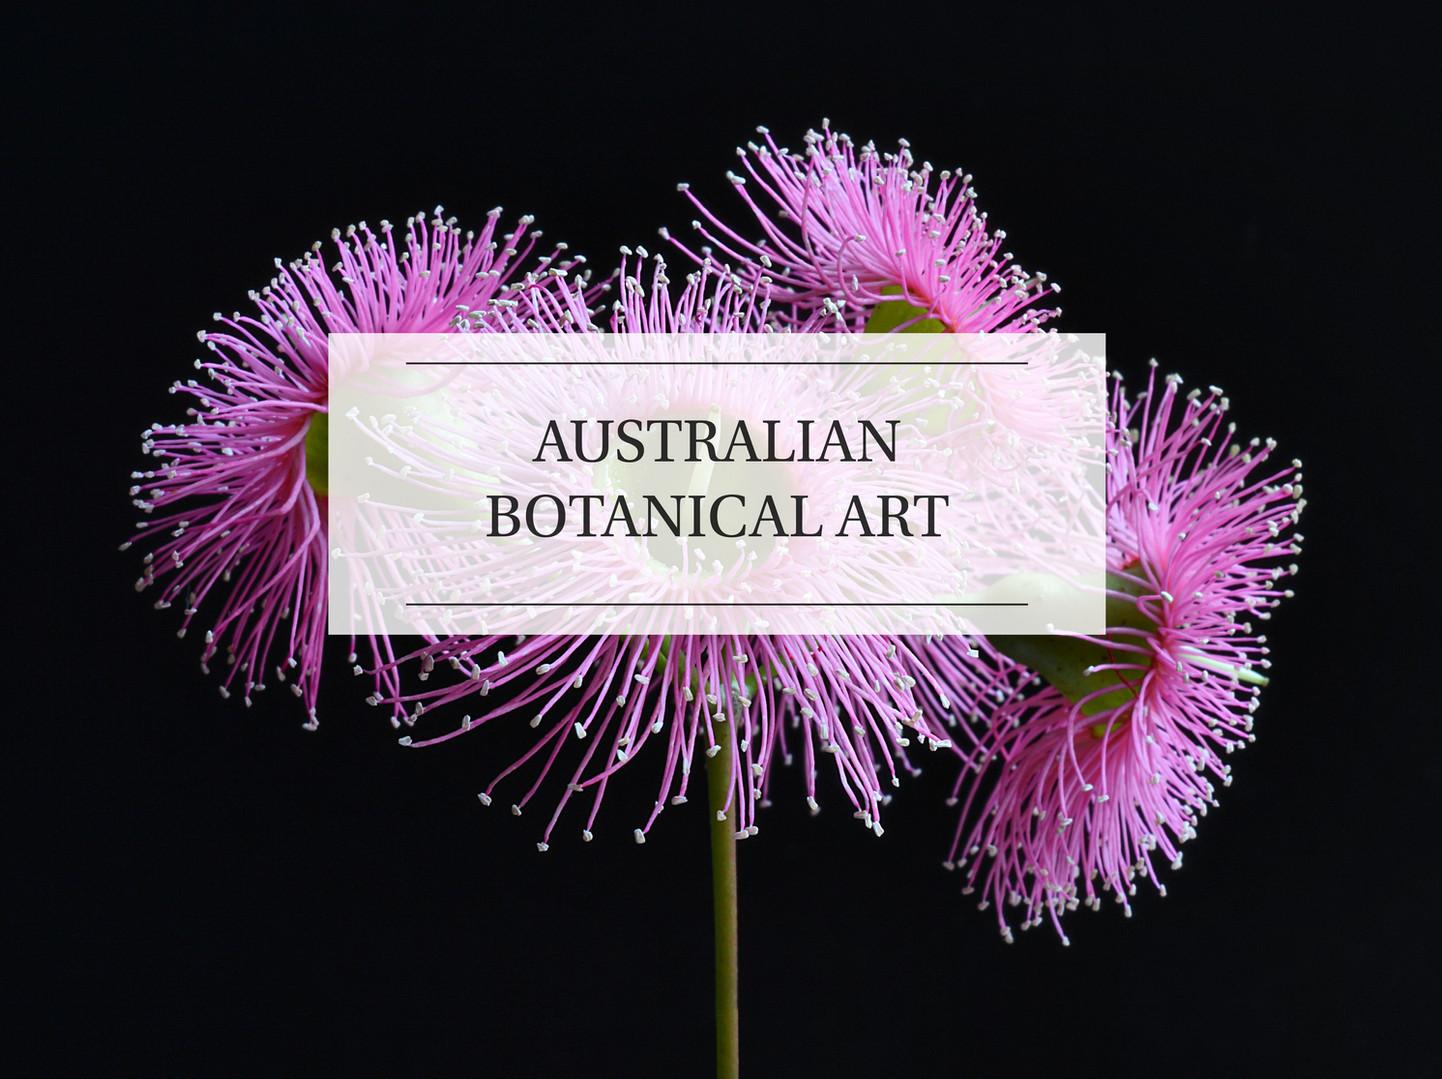 AUSTRALIAN BOTANICAL ART